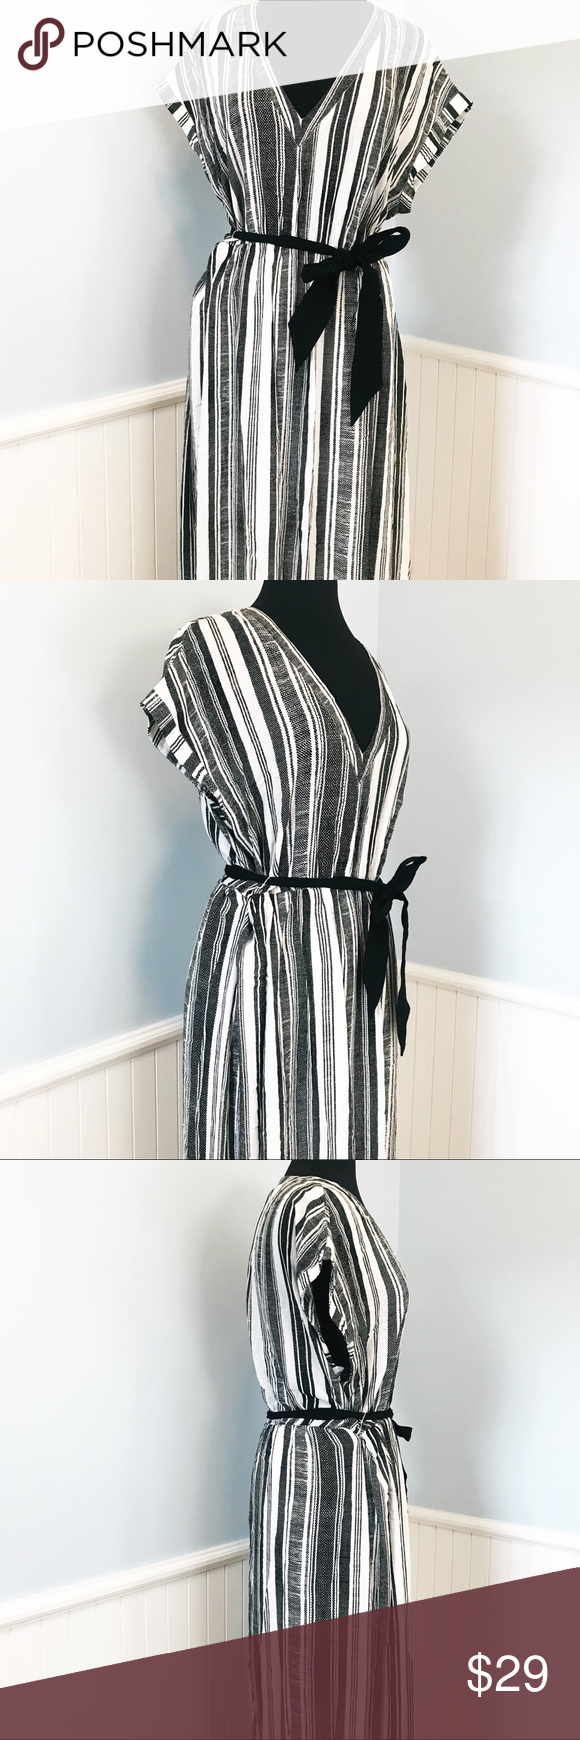 H M Black White Vertical Stripe Maxi Dress Striped Maxi Dresses Maxi Dress Vertical Stripe [ 1740 x 580 Pixel ]